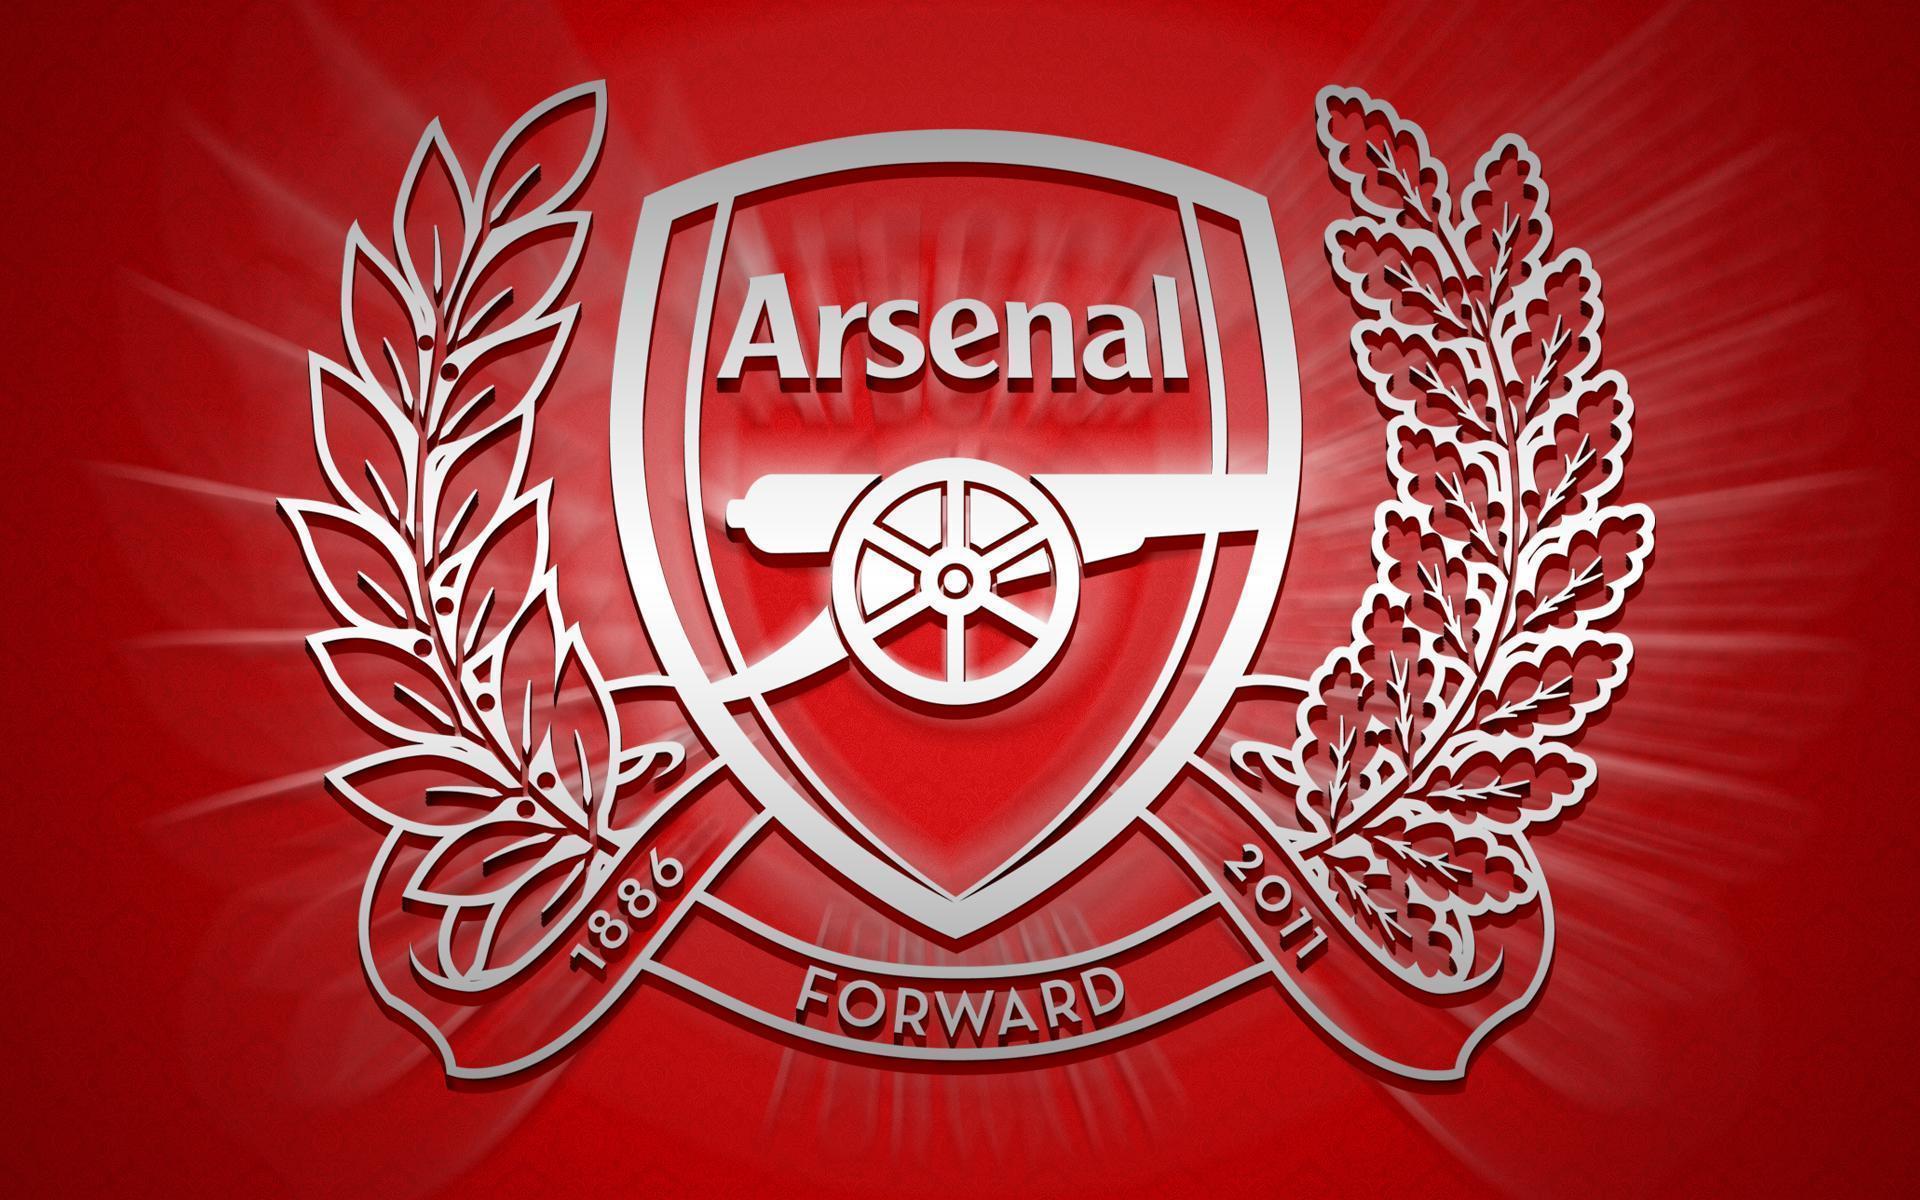 Arsenal Logo Wallpapers 2015 1920x1200